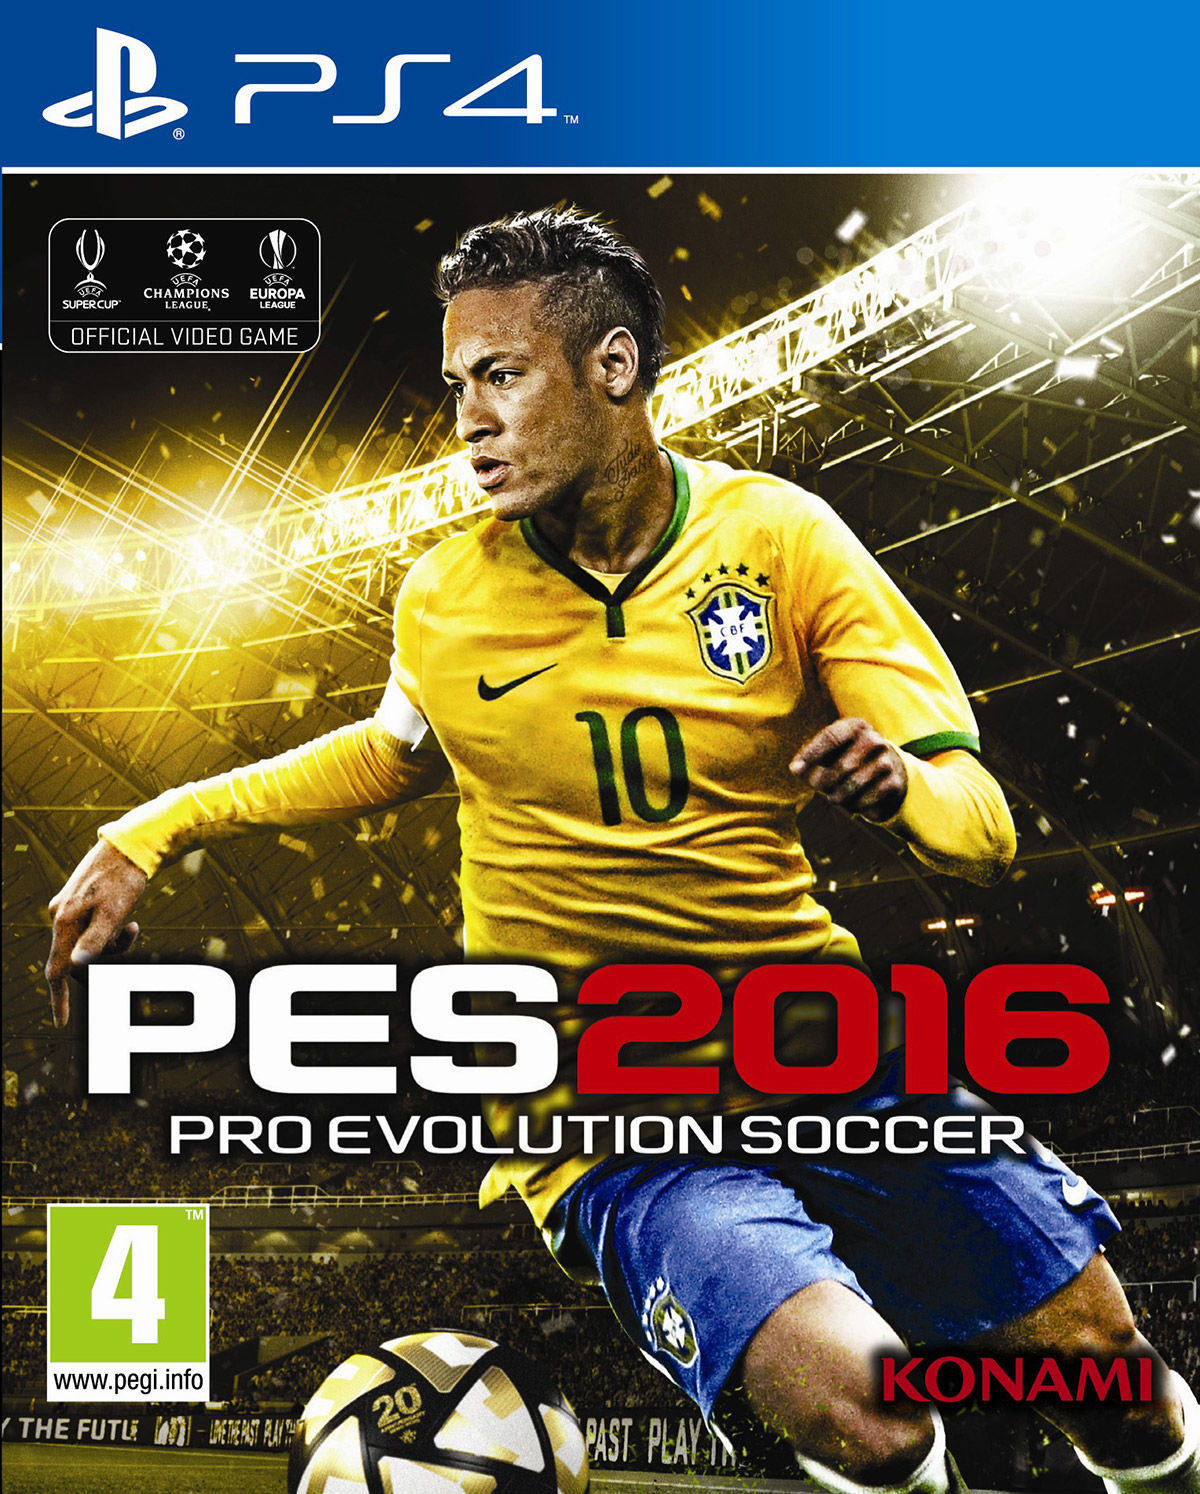 ���� Pro Evolution Soccer 2016